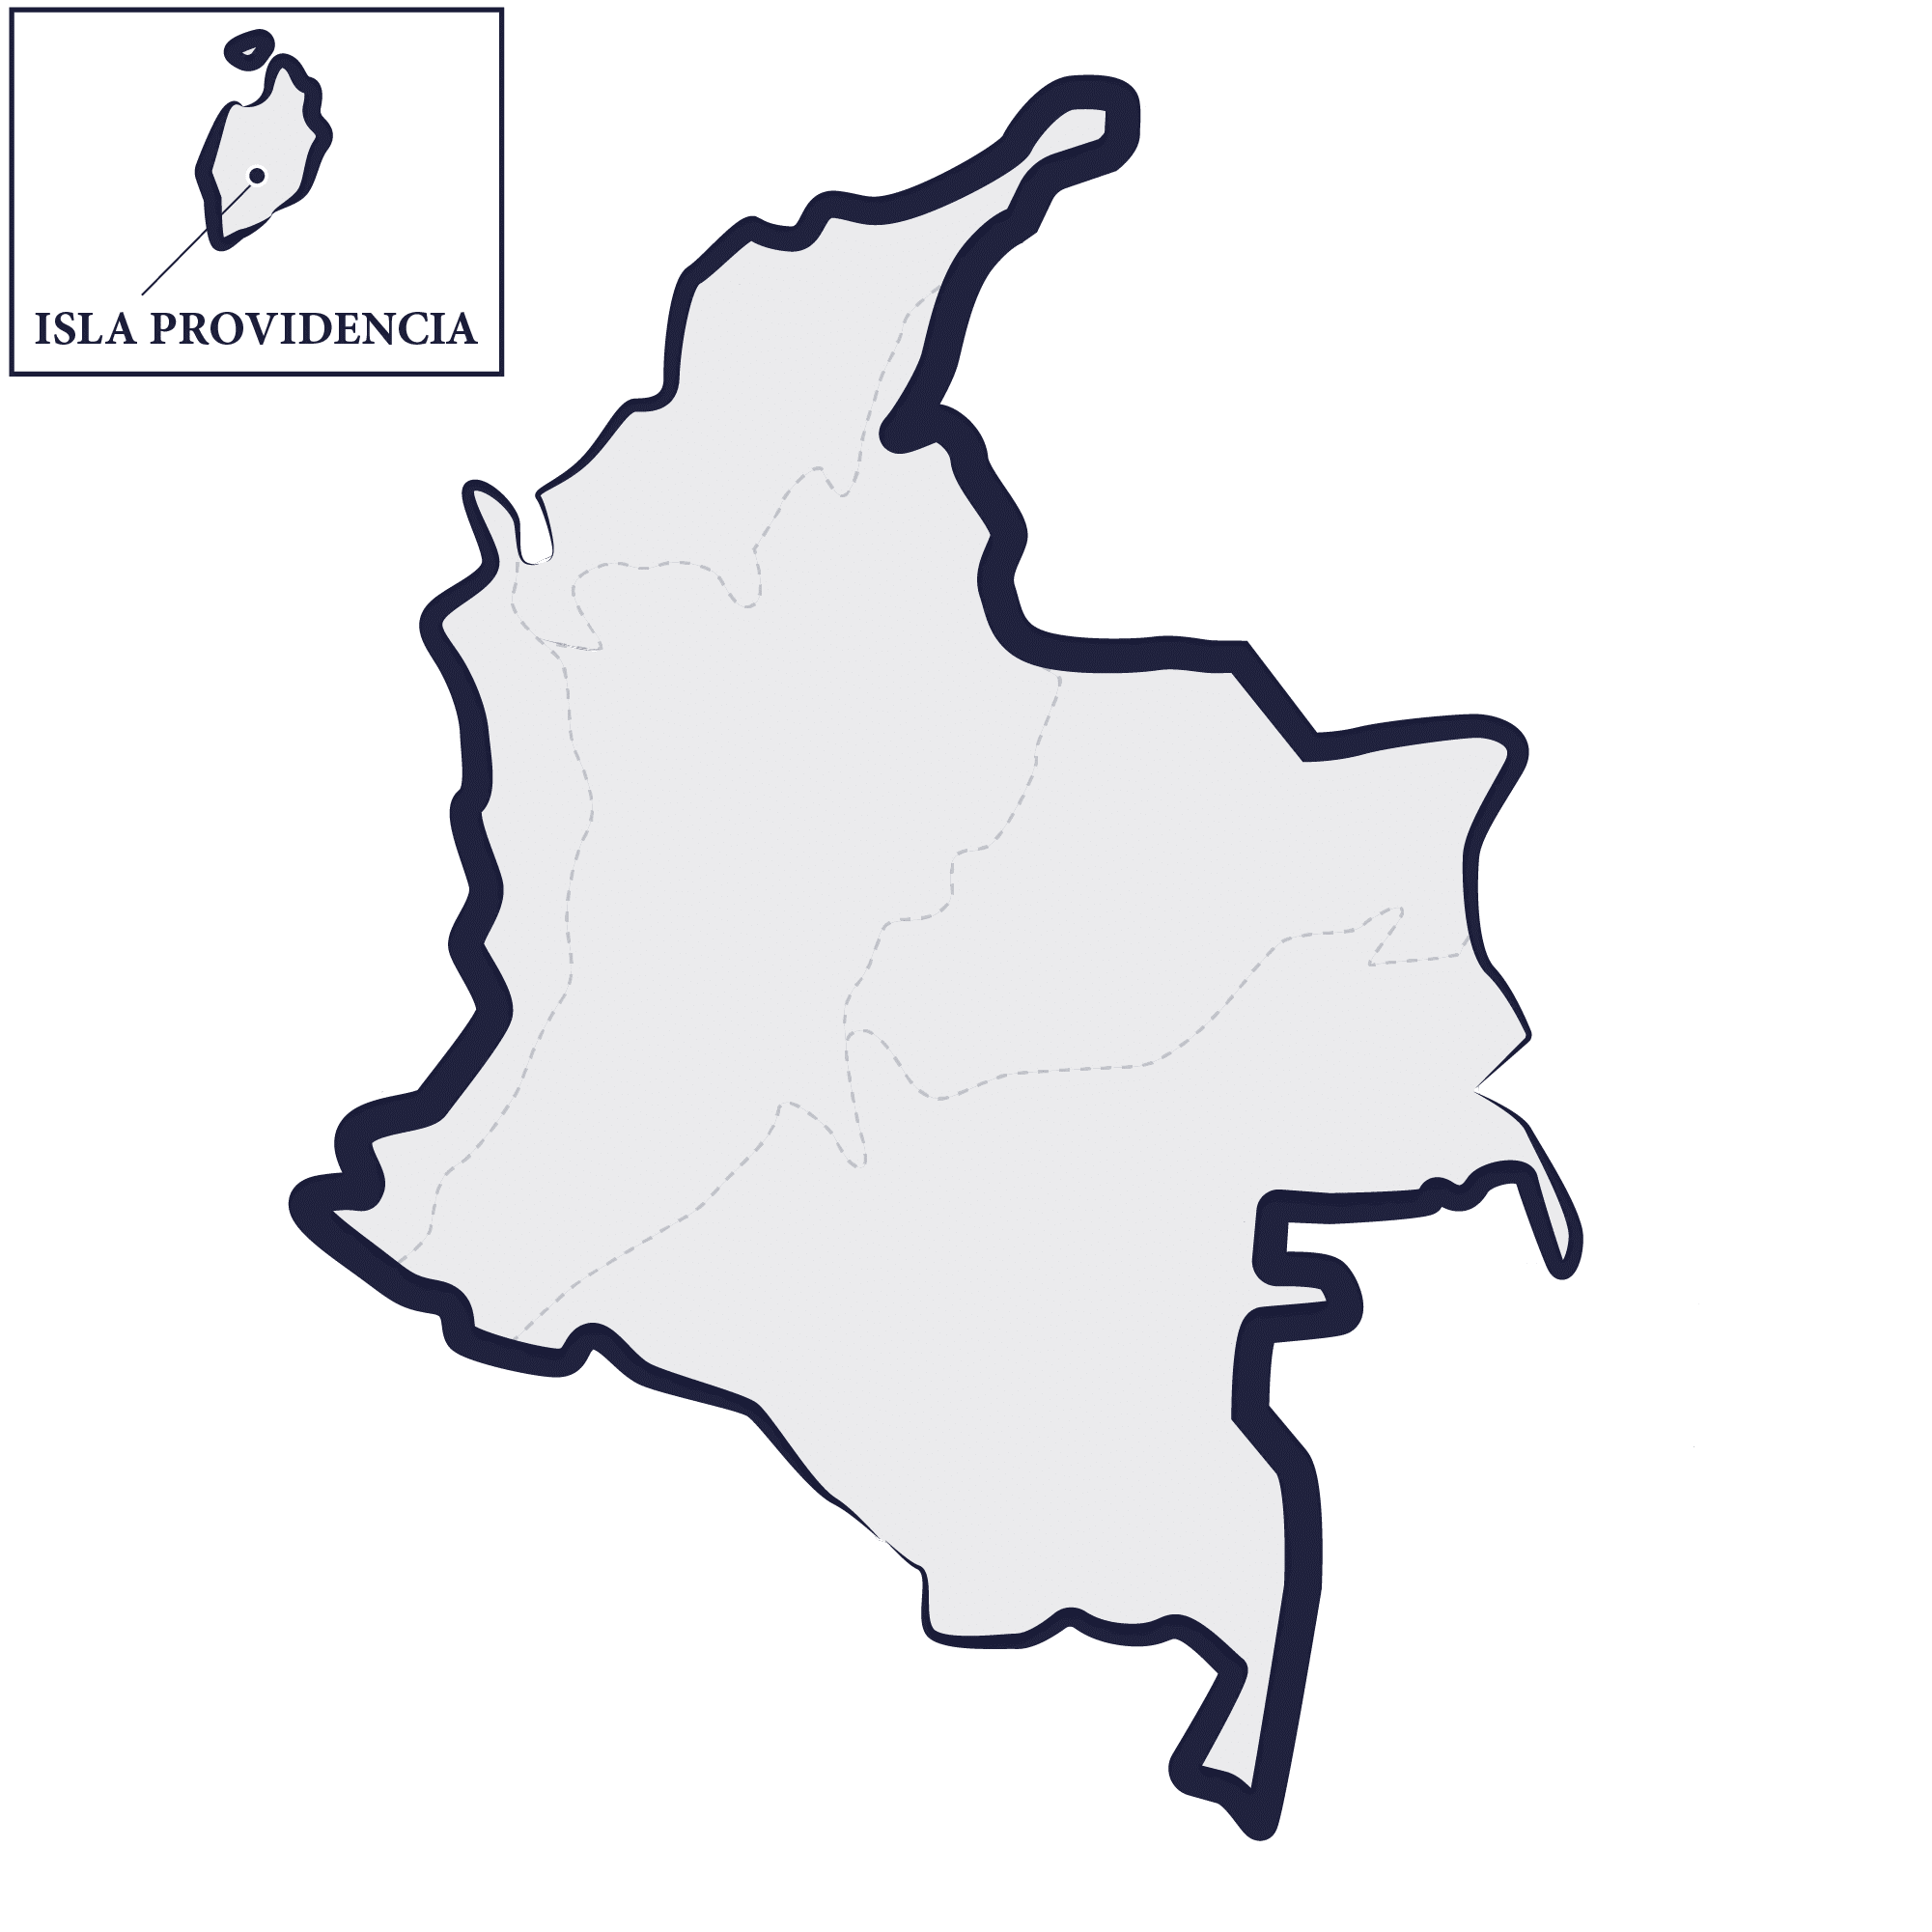 carte colombie providencia